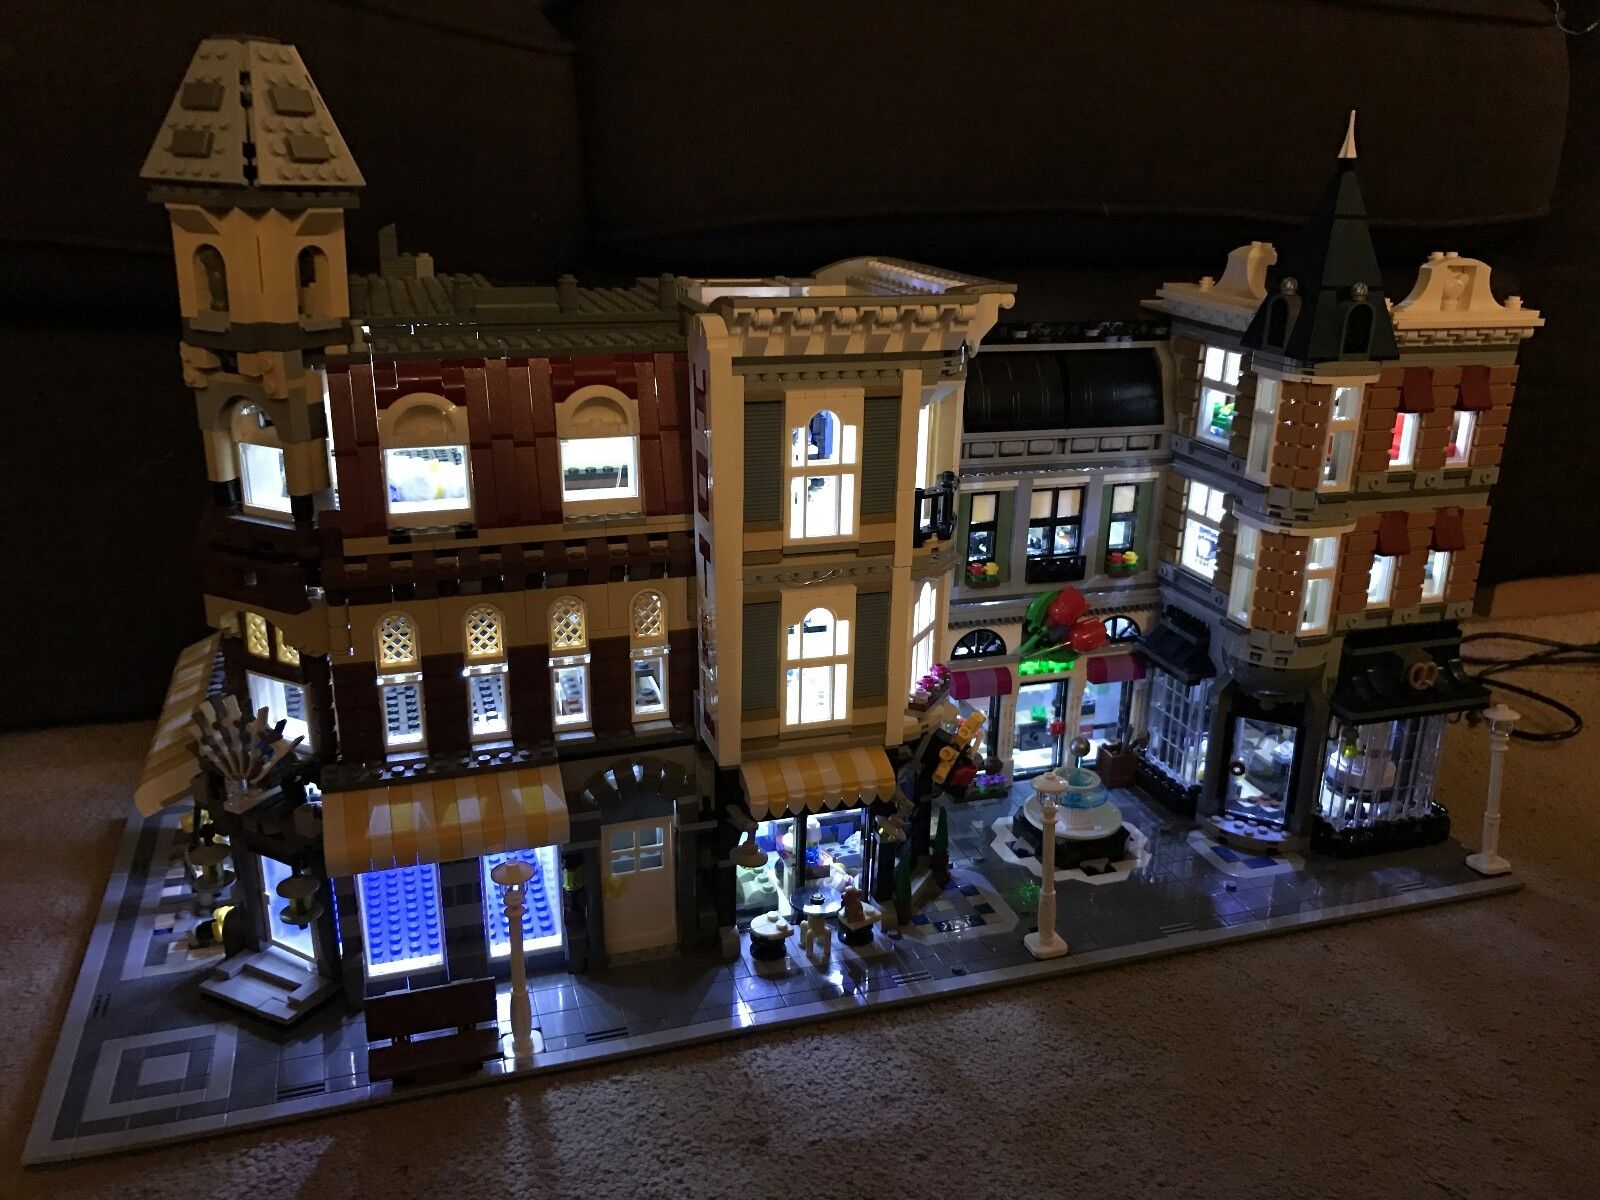 LEGO CREATOR EXPERT MODULARE Triple-Illuminazione LED Luce Kit (USB-powered, Set di 3x)